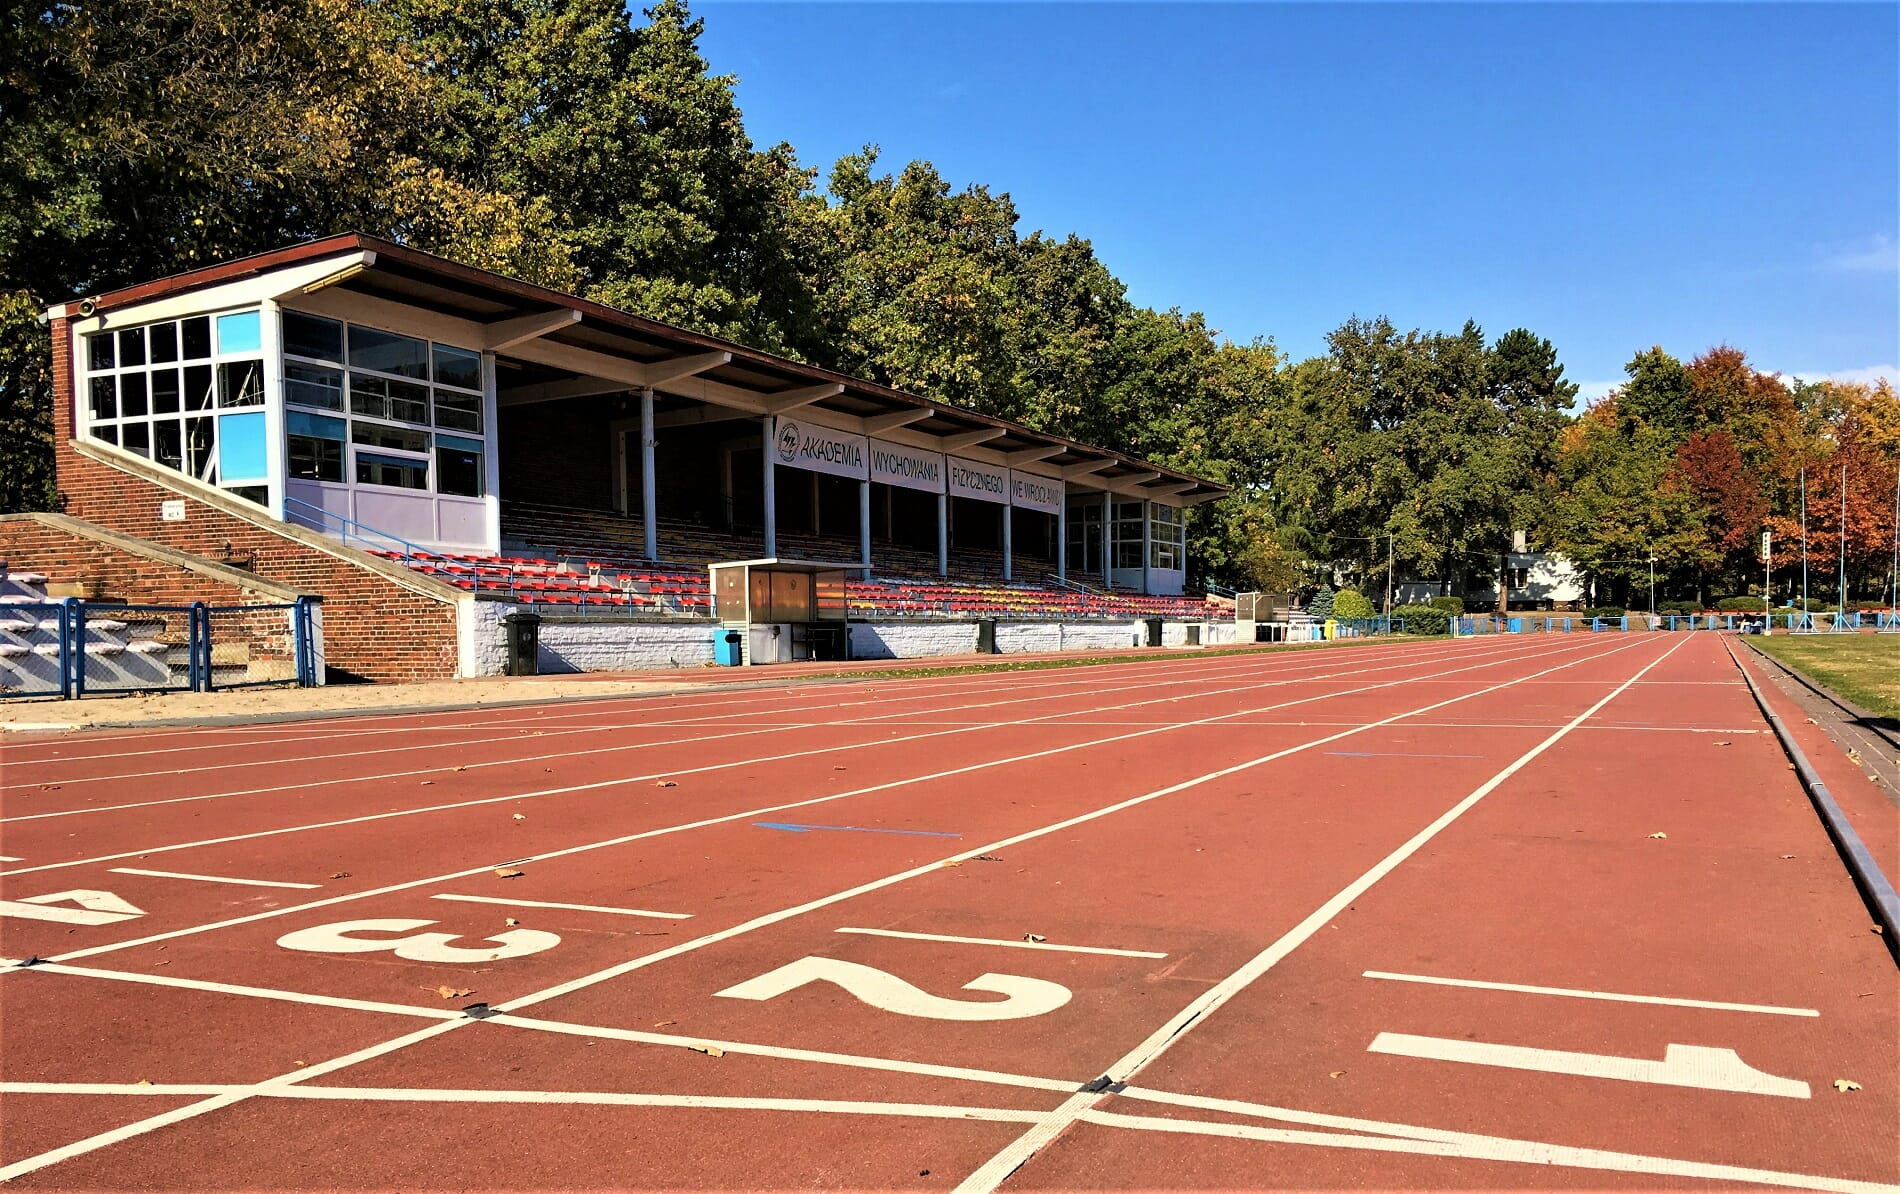 Academic Sports Center - athletics track